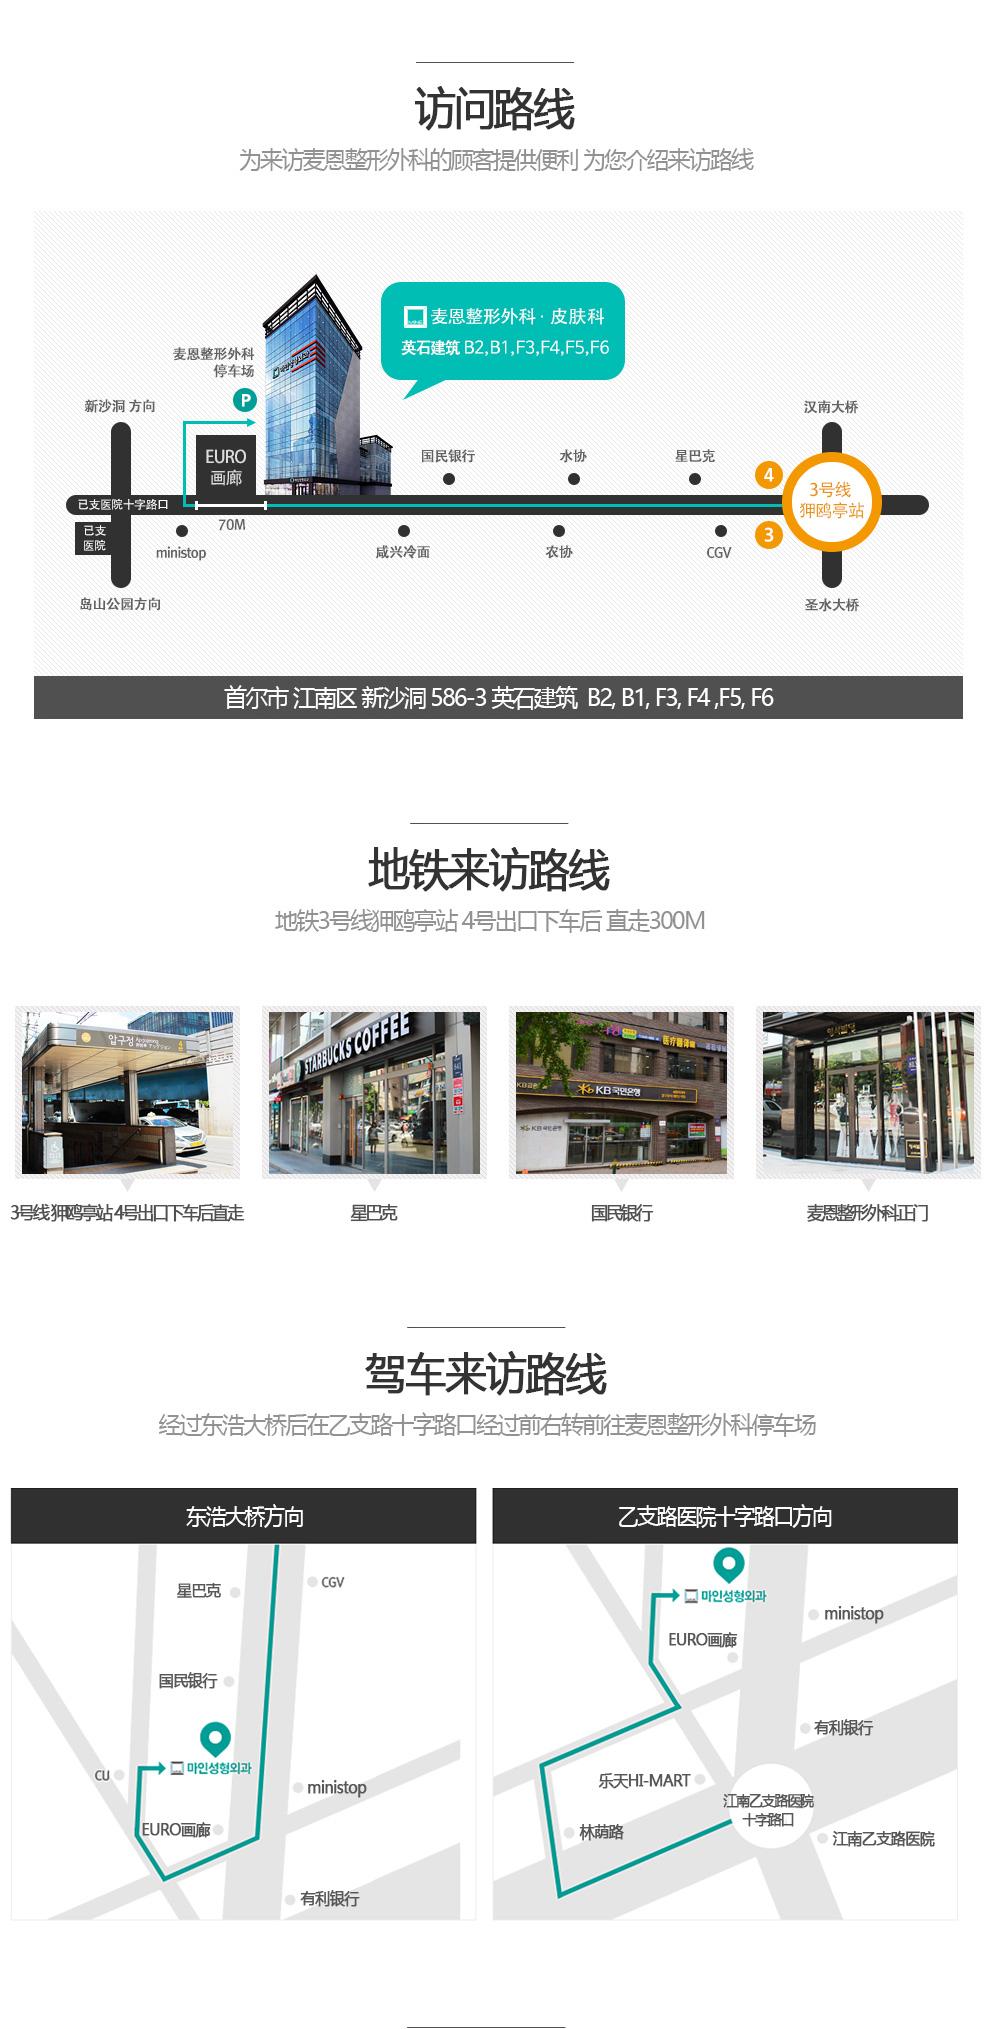 location-img1.jpg